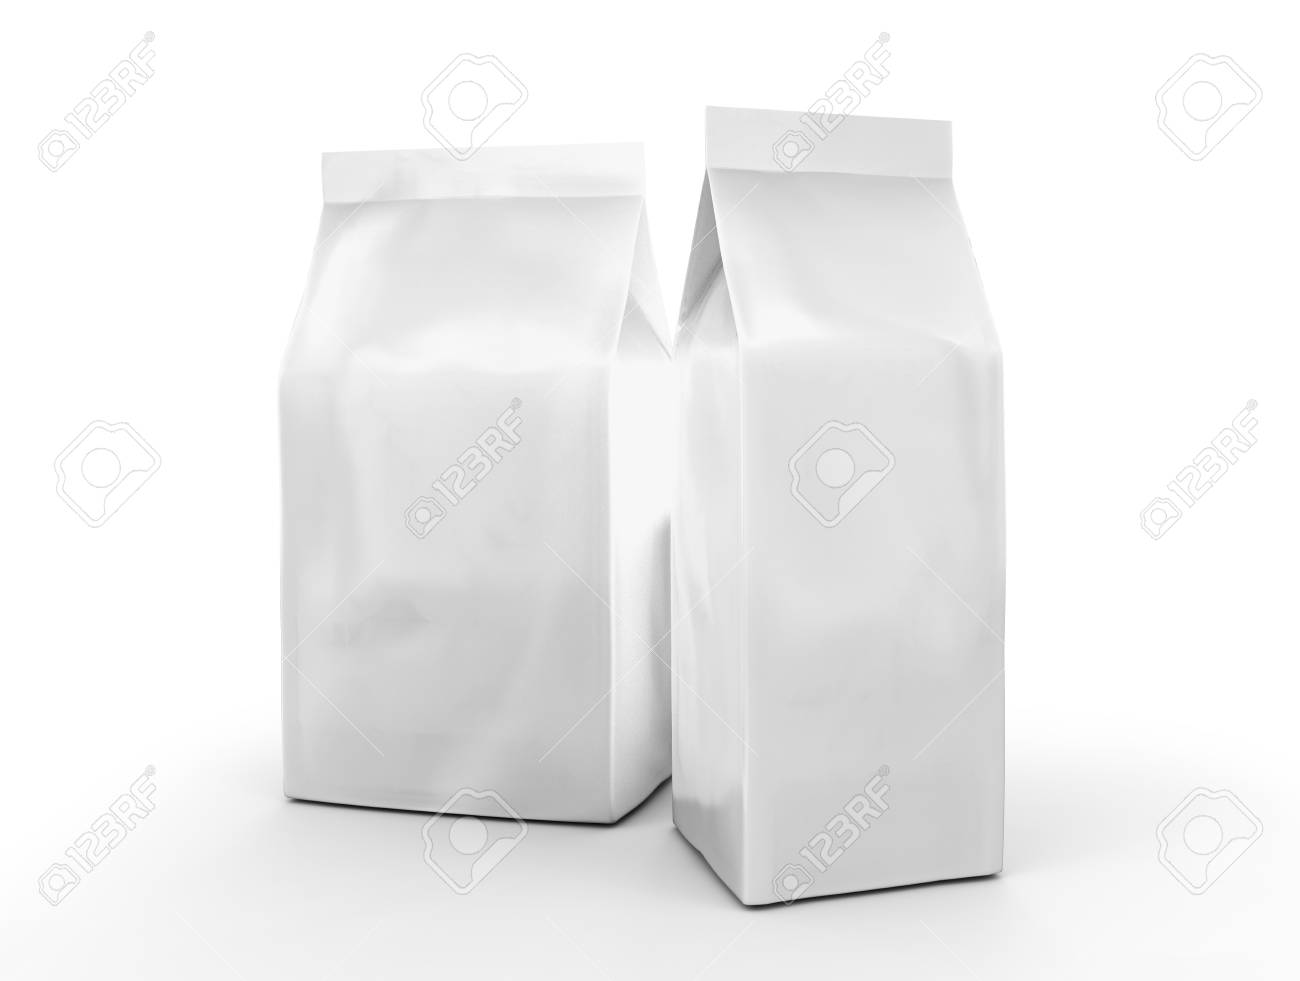 pearl white coffee bean bag mockup blank foil bag template in